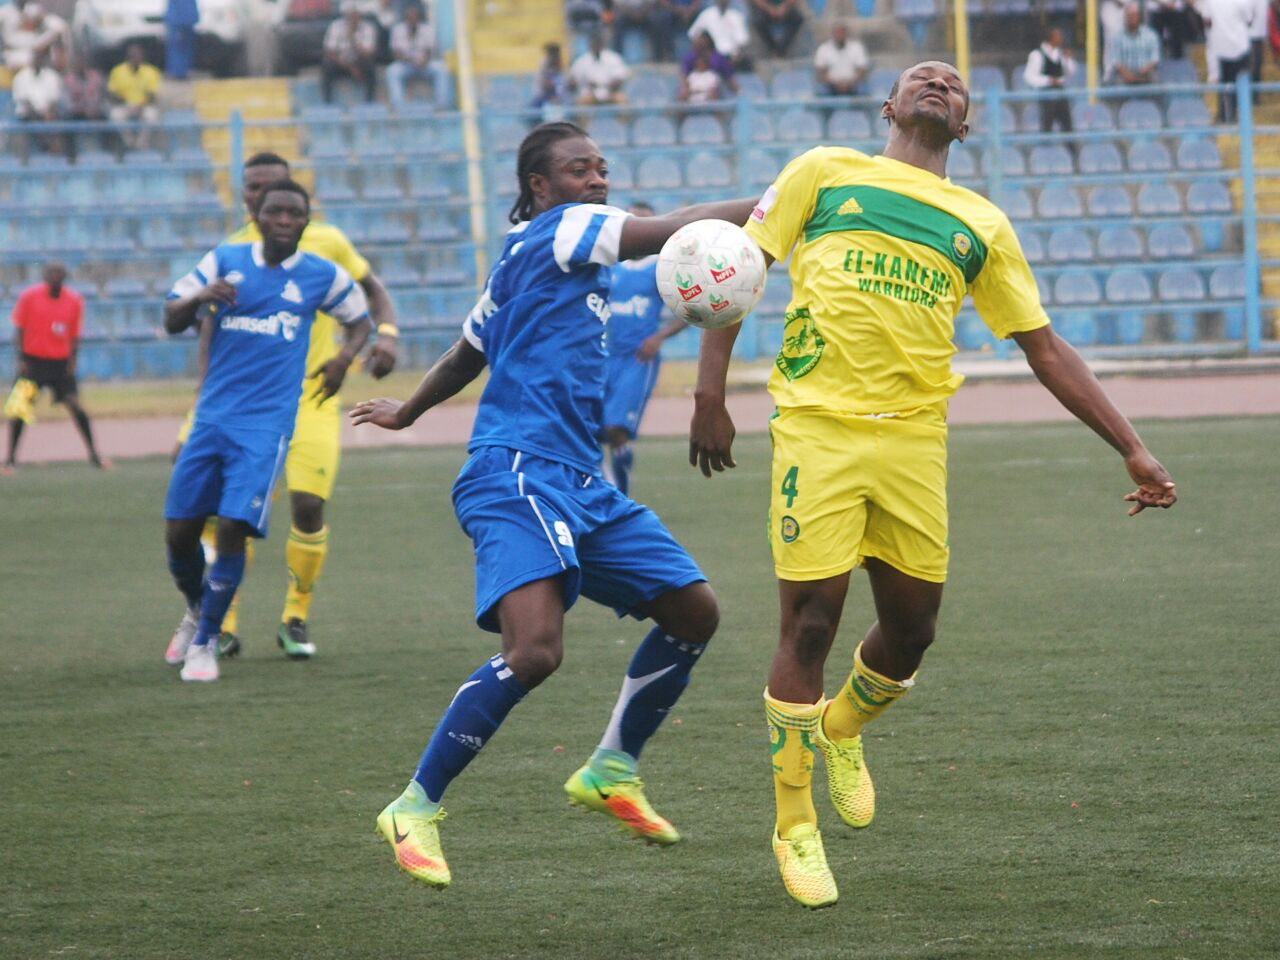 NPFL: Rangers Hold Nasarawa, Sunshine Pip 3SC, Plateau Beat Enyimba